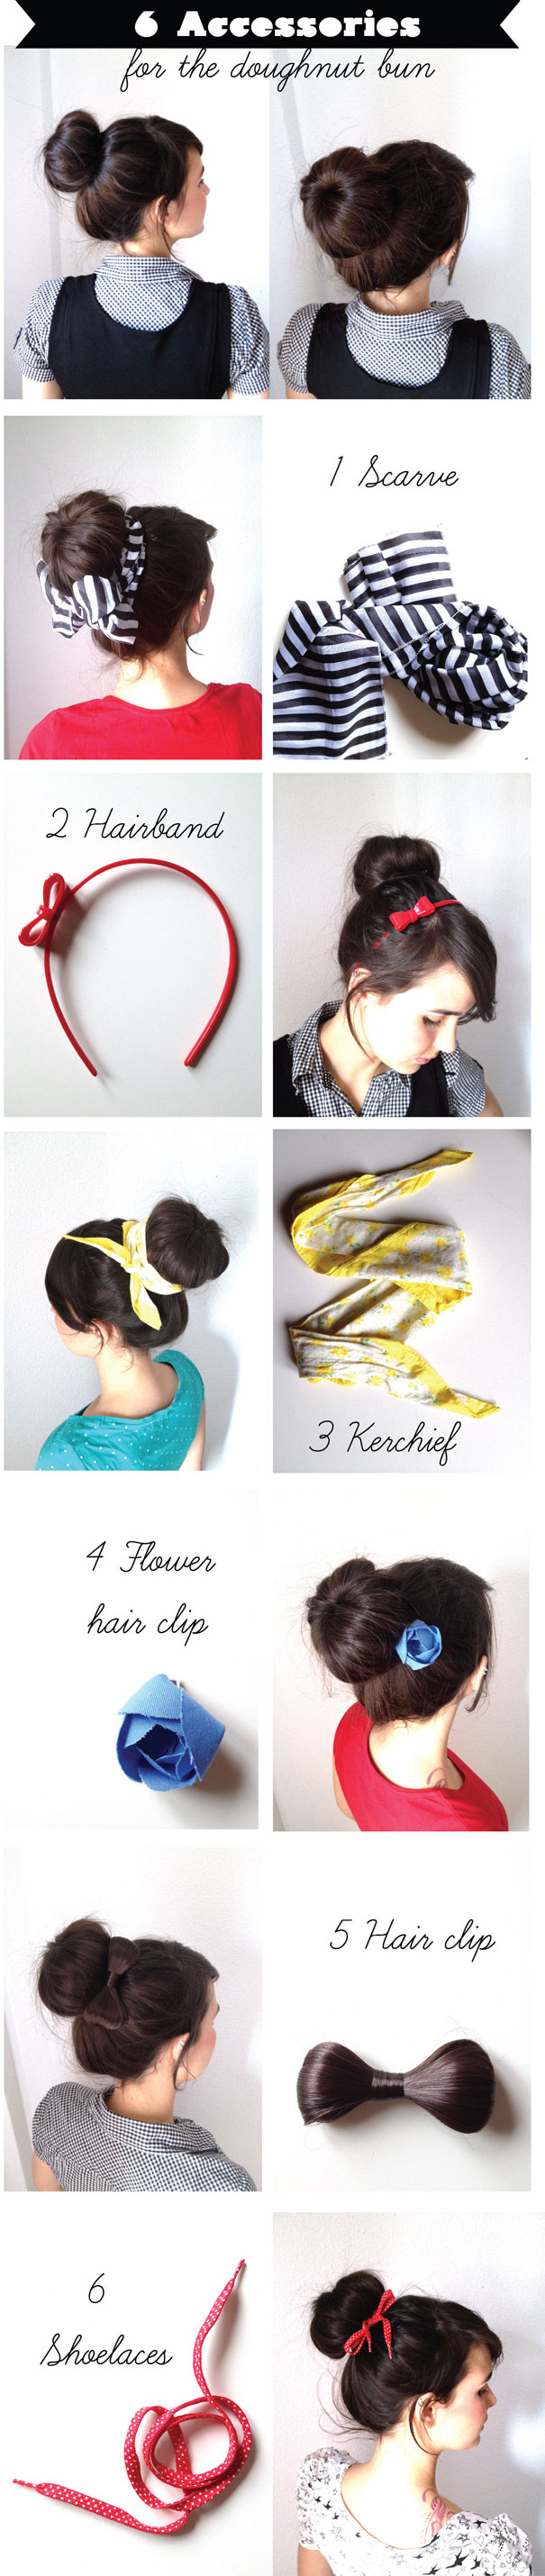 Accessory Ideas for Your Bun